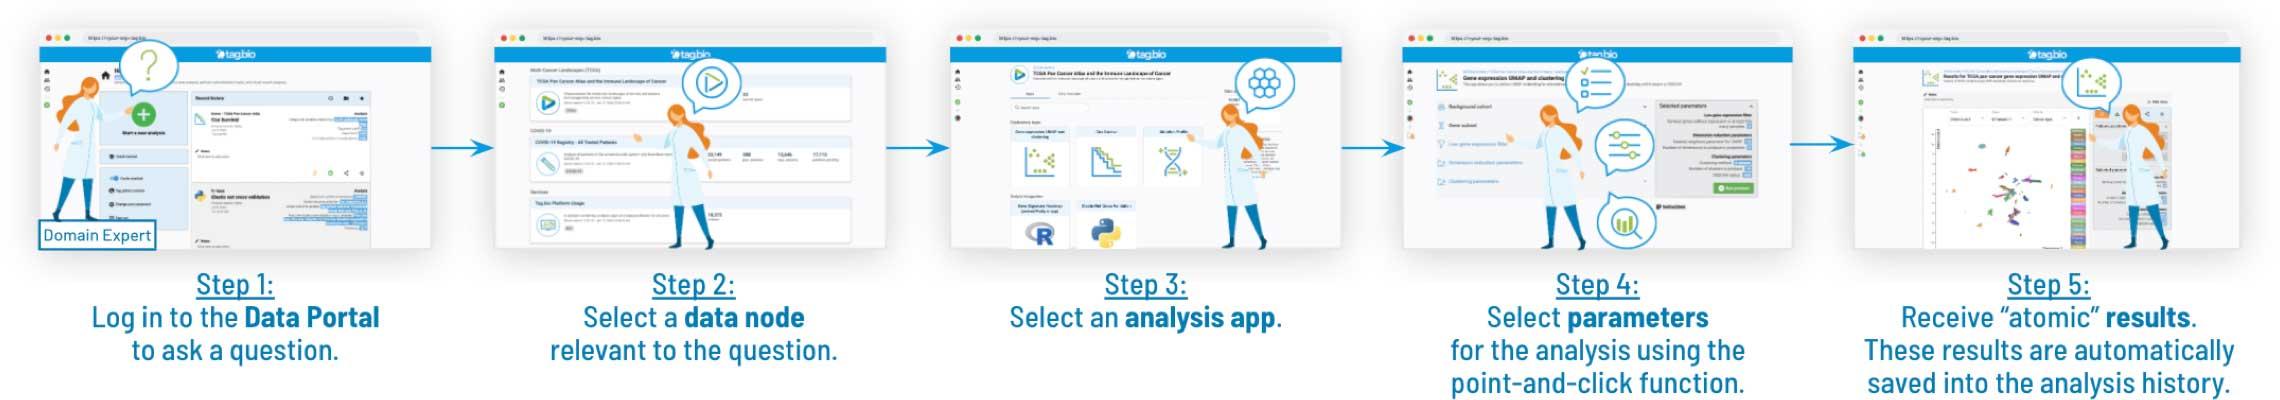 Tag.bio - how to run an analysis